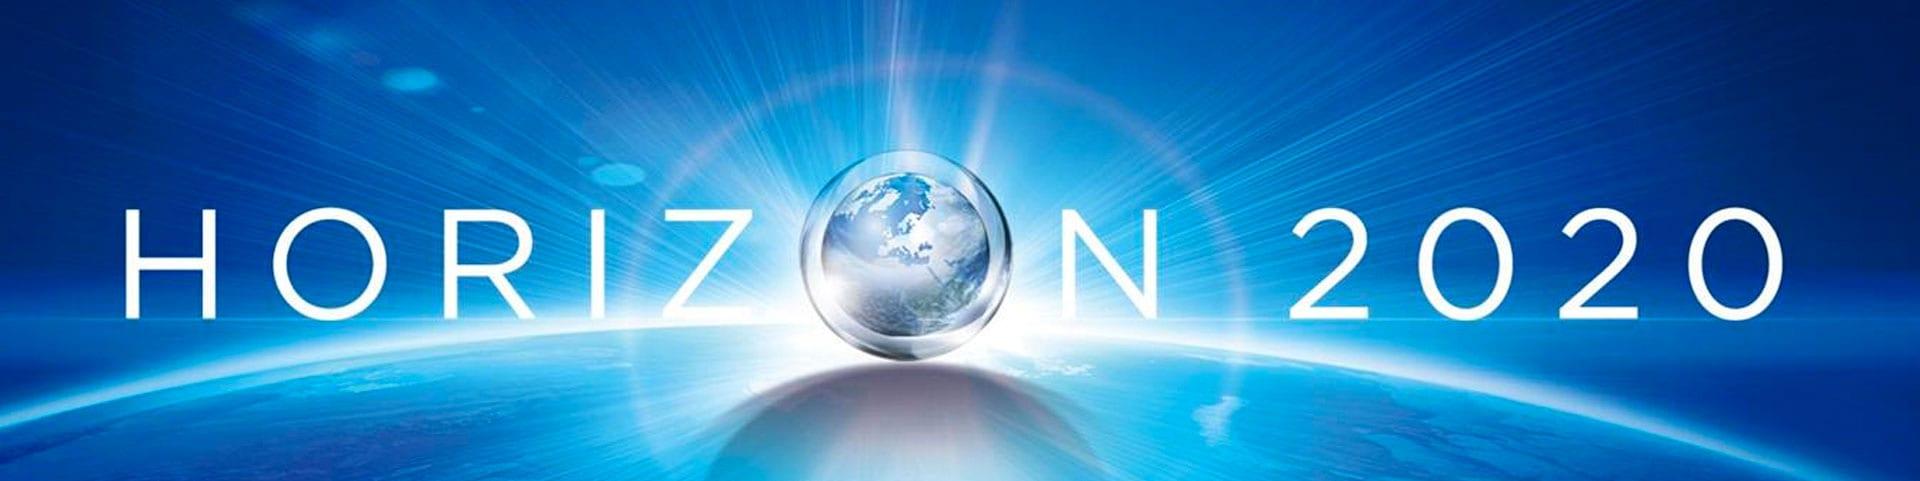 Horizon 2020no alt text set su stradedeuropa.eu